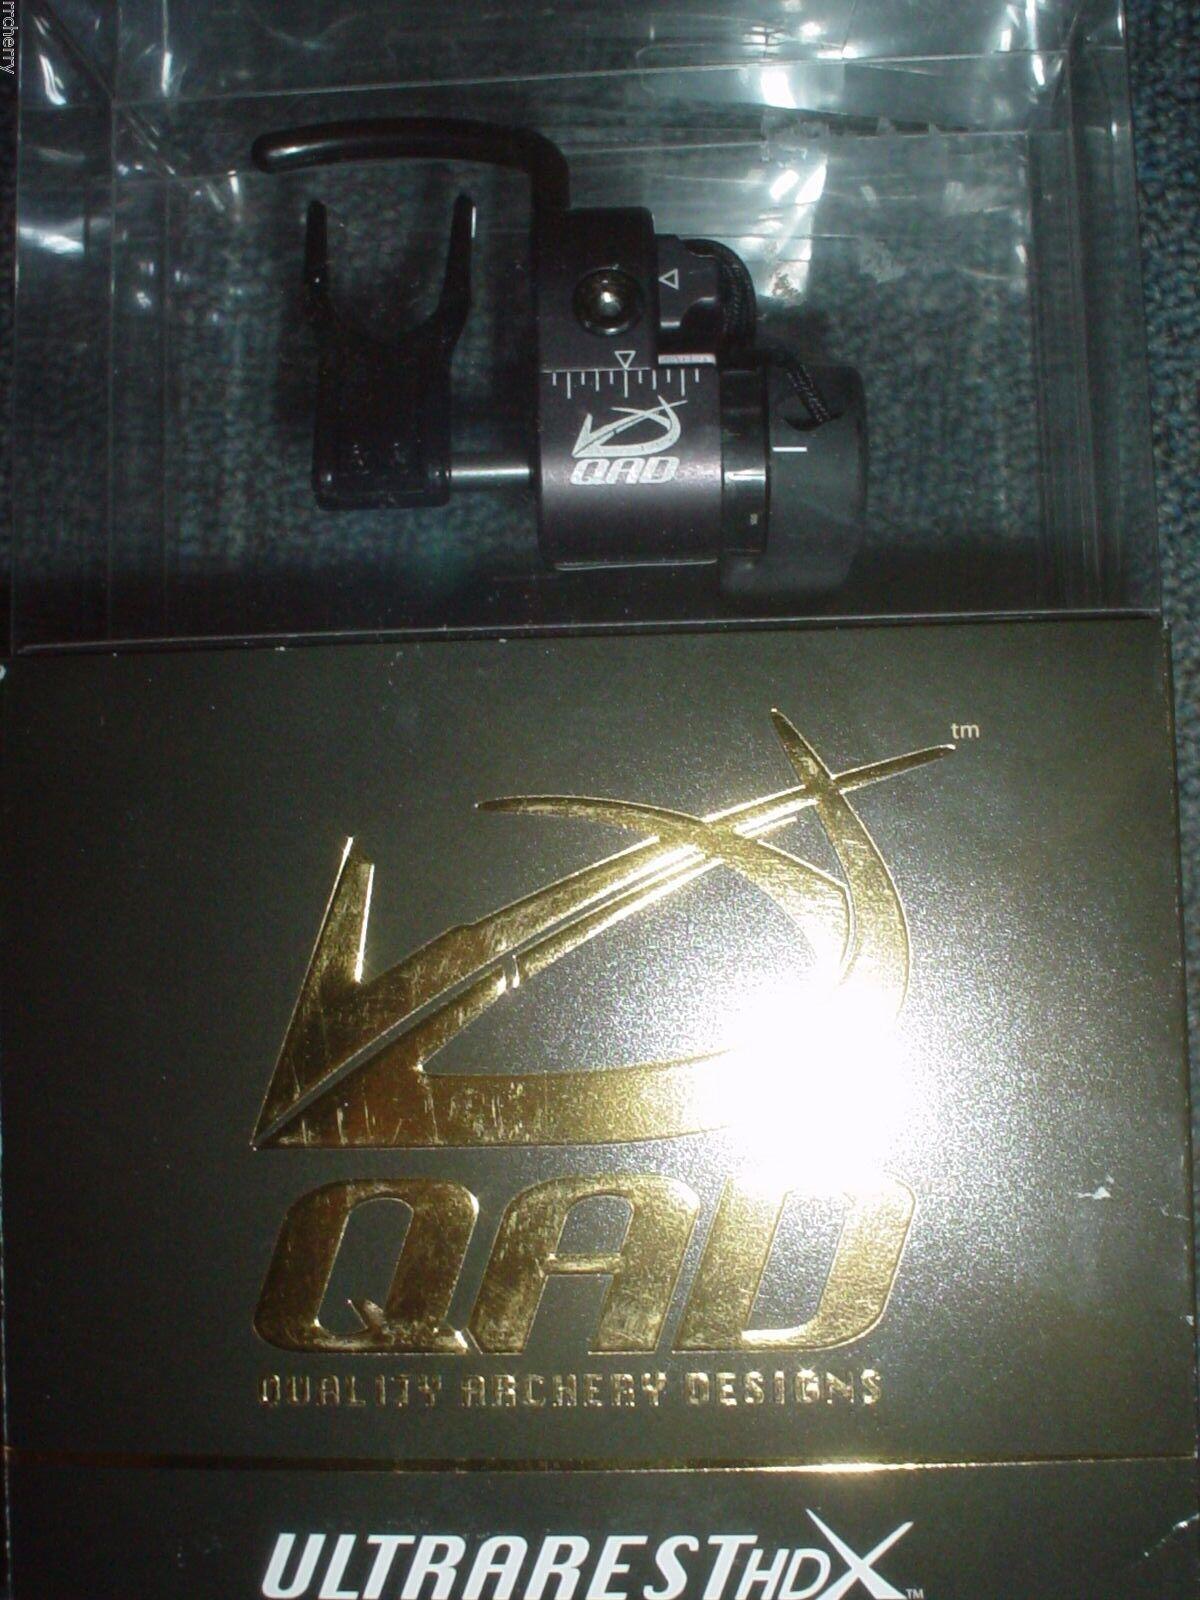 @NEW @ QAD Ultra Pro HDX resto De Flecha Negra Hd-X HDX ultrarest